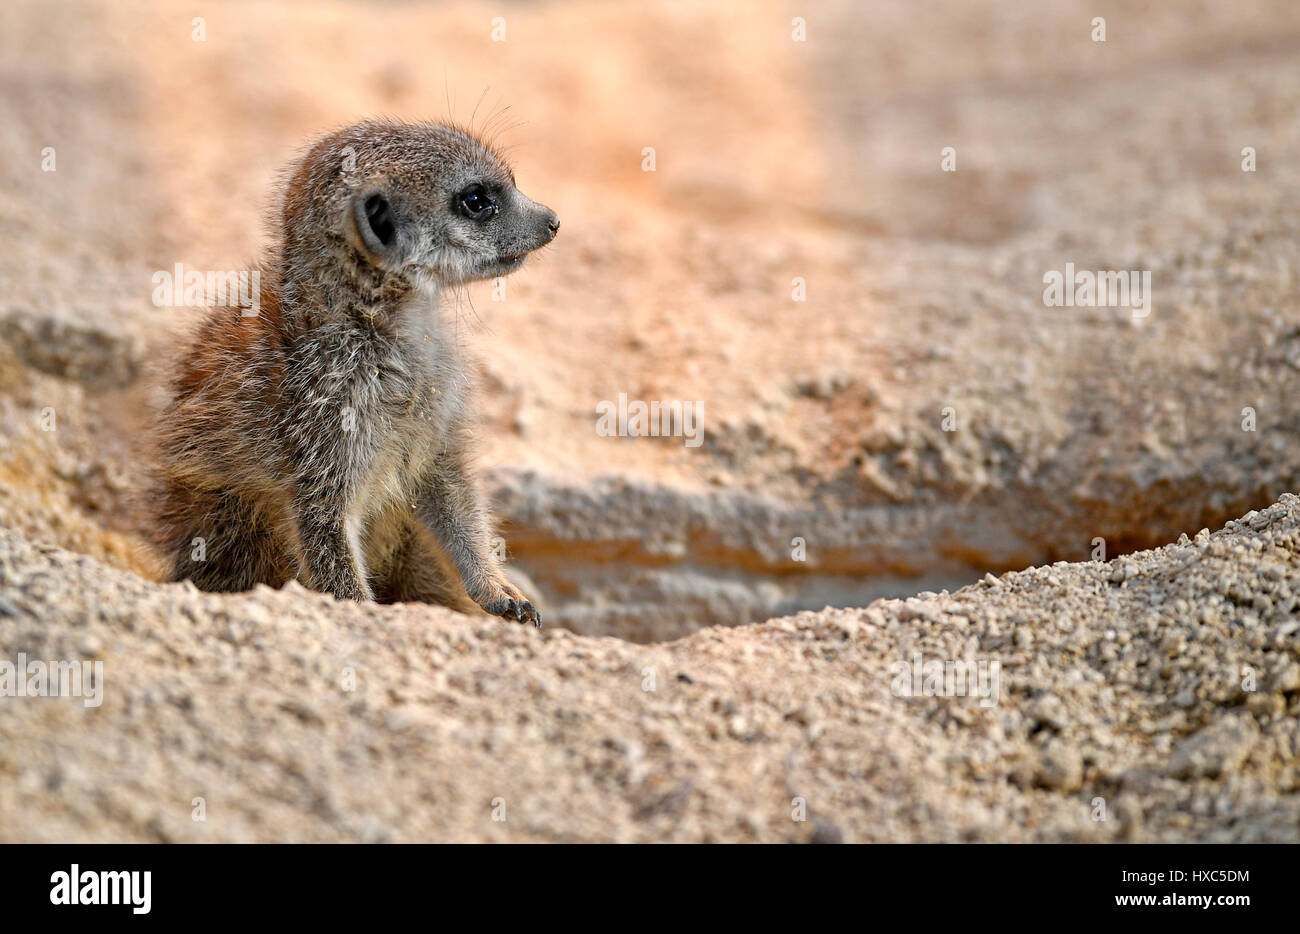 Meerkat (Suricata suricatta), juvenile 10 weeks, captive - Stock Image